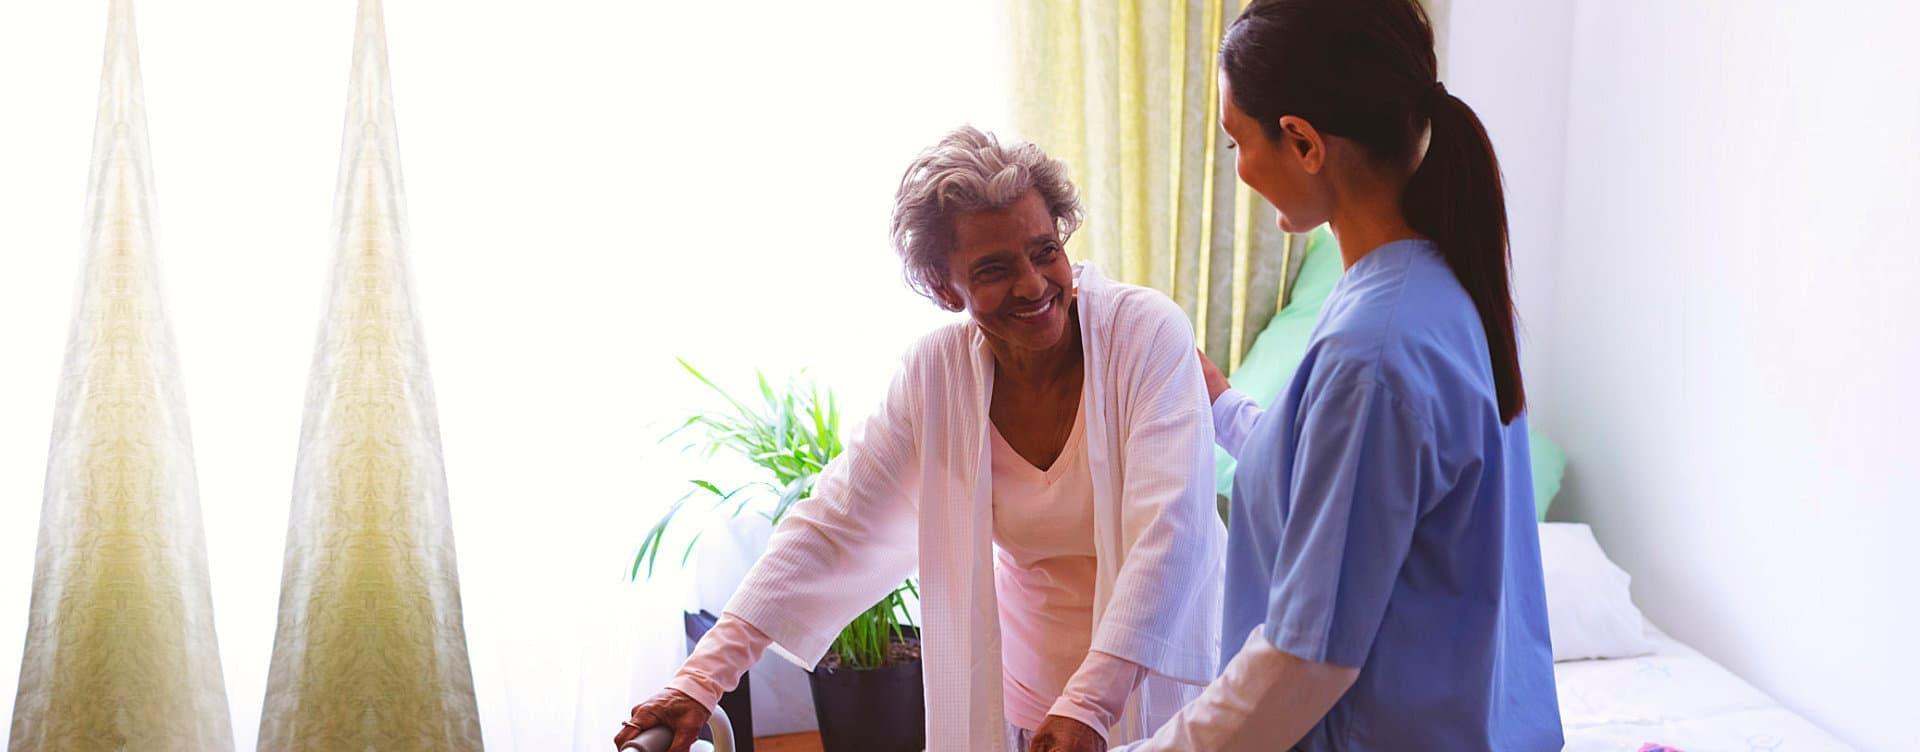 happy senior woman looking at caregiver